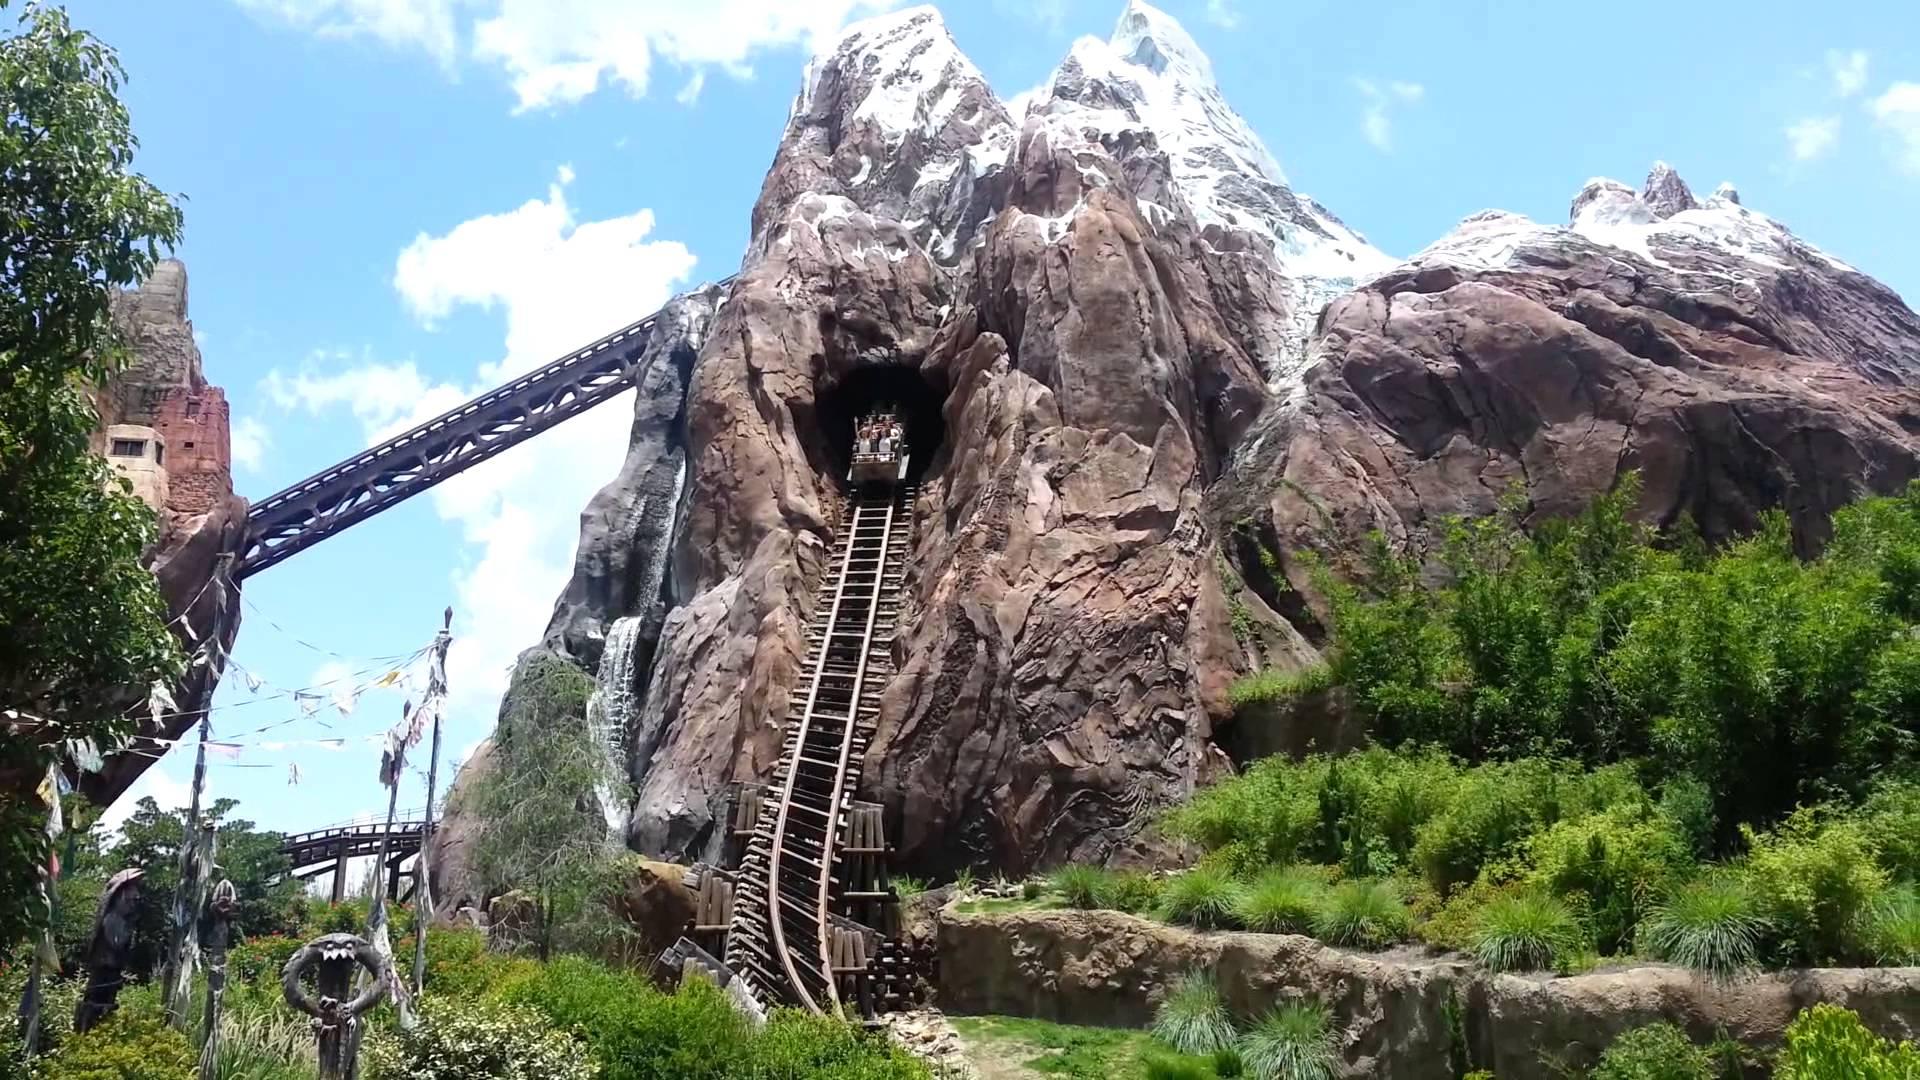 Everest Animal Kingdom GO USA